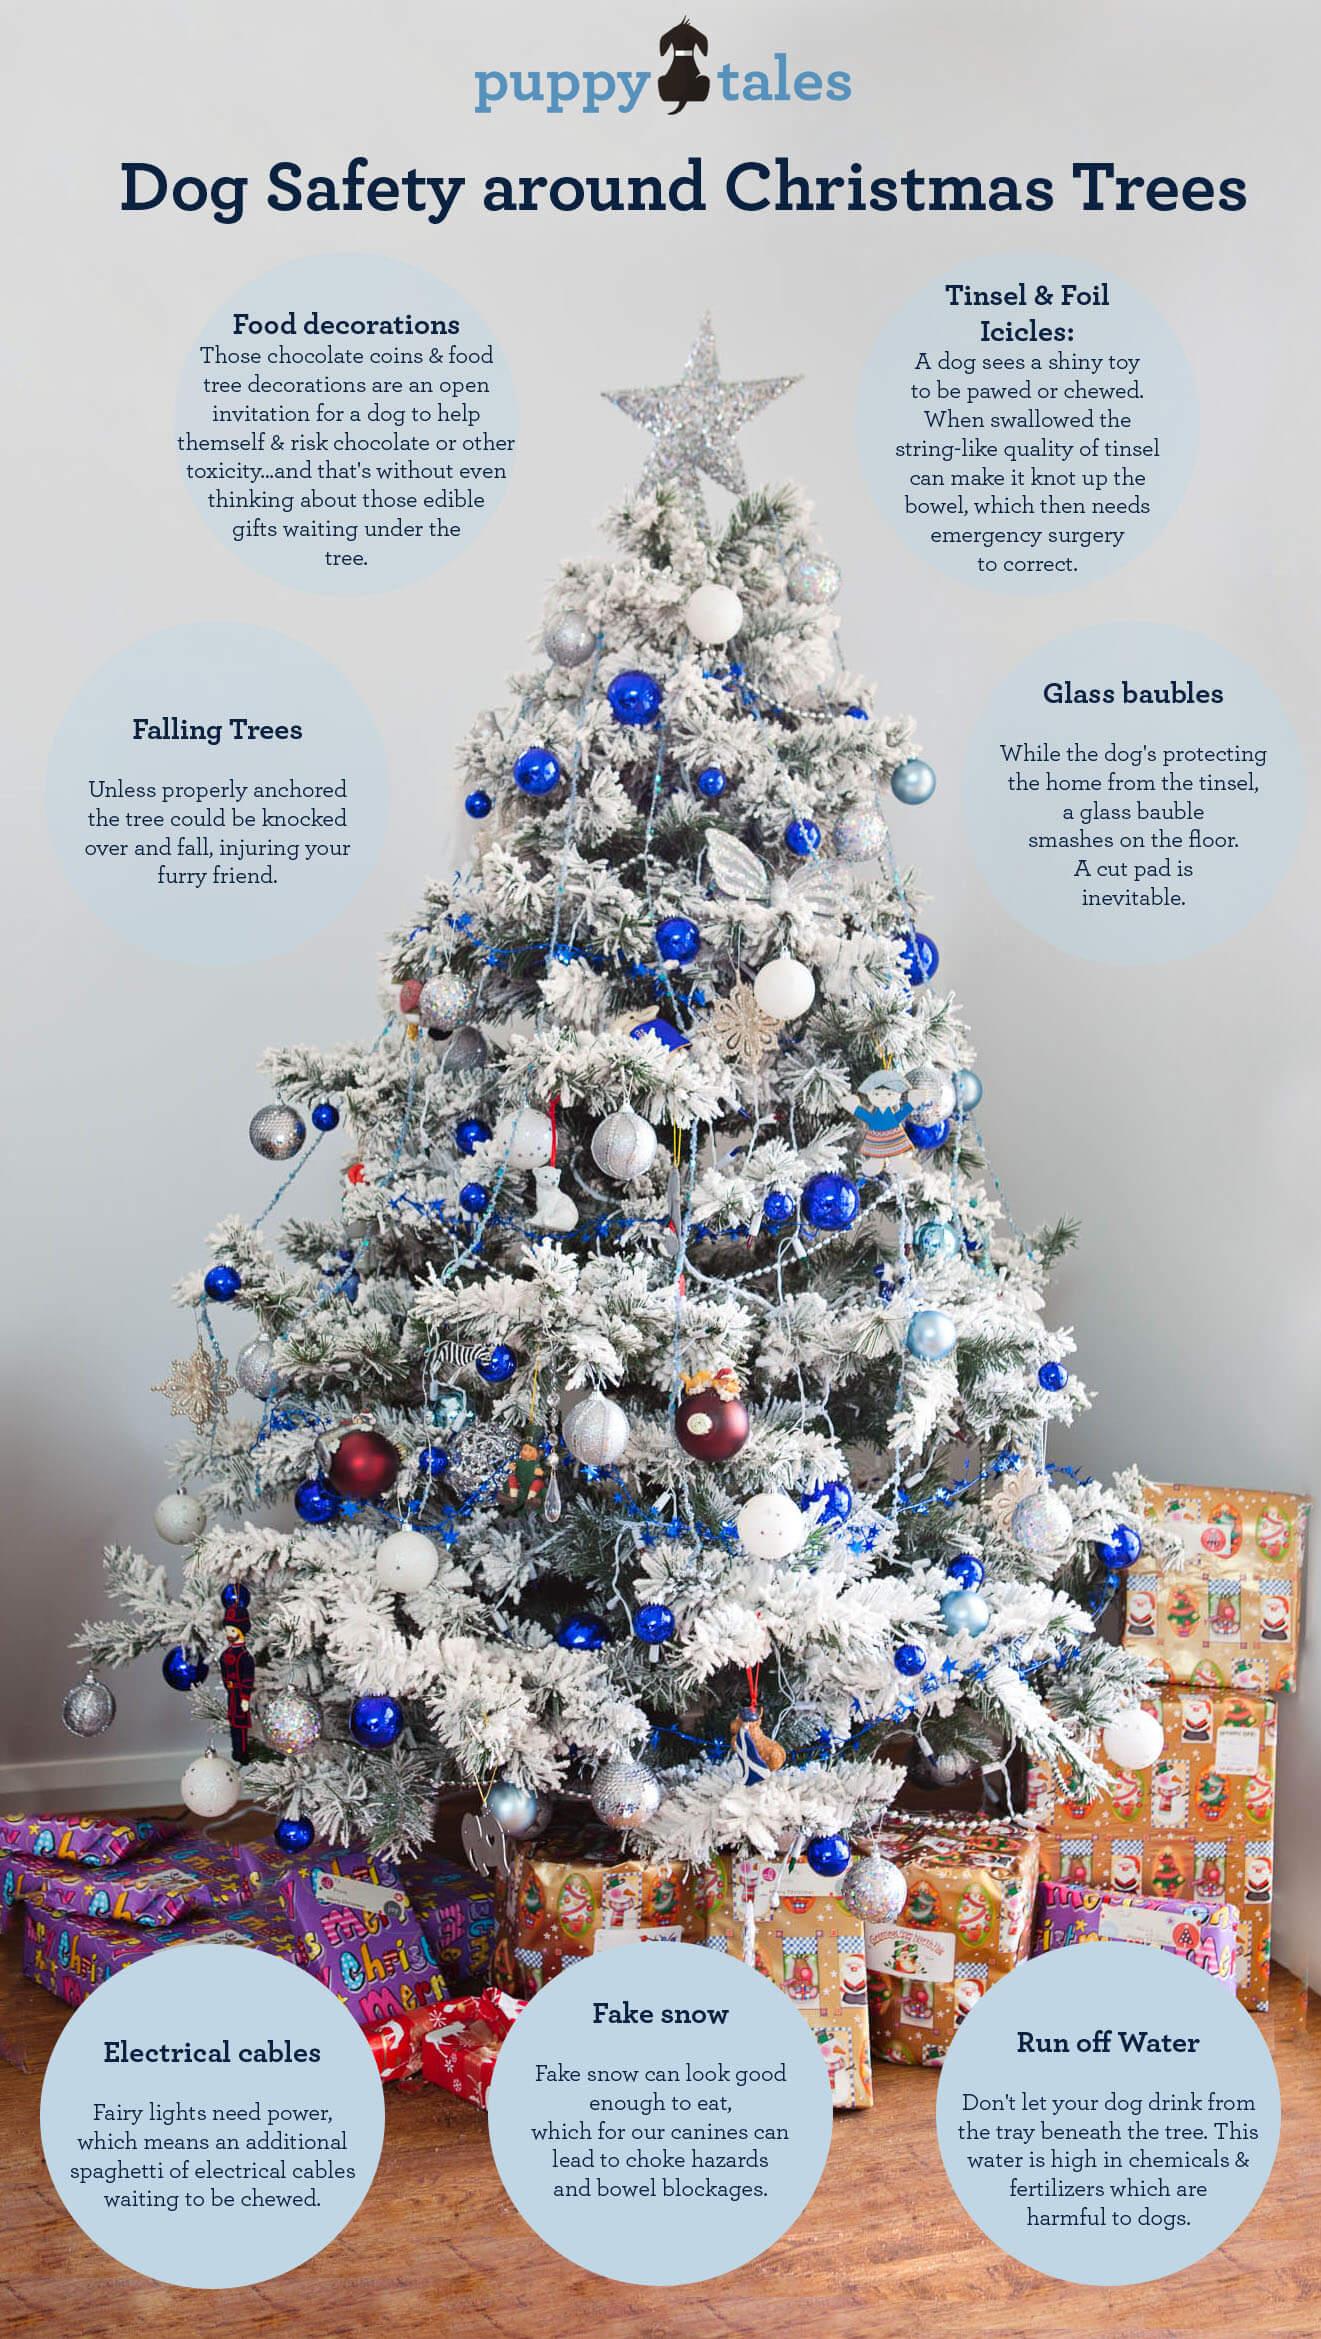 Dog Safety around Christmas Trees